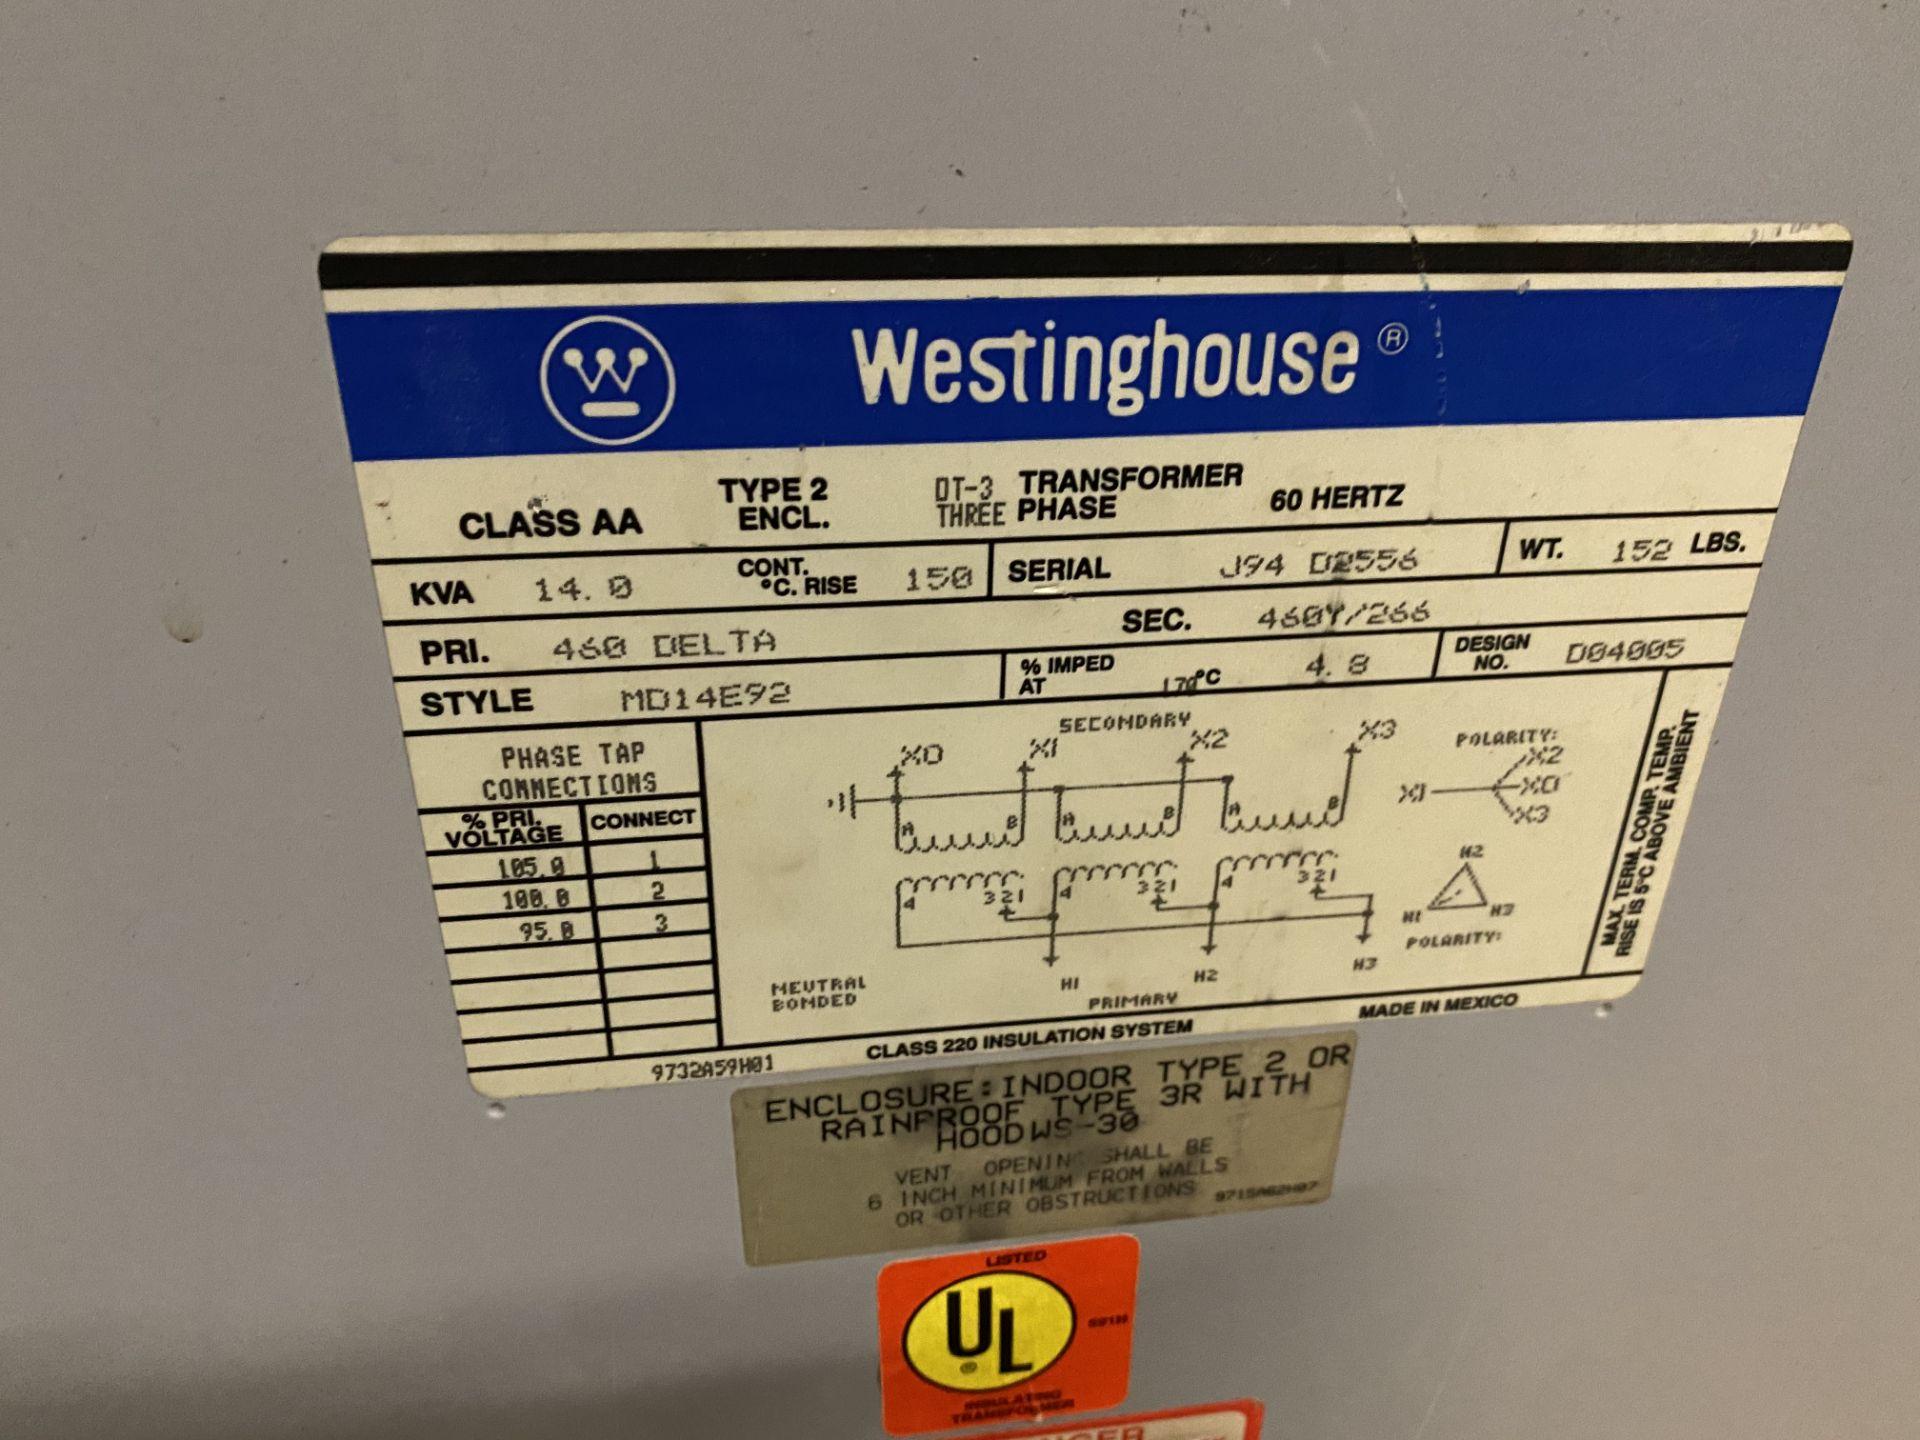 Westinghouse 14 KVA Transformer - Image 2 of 2